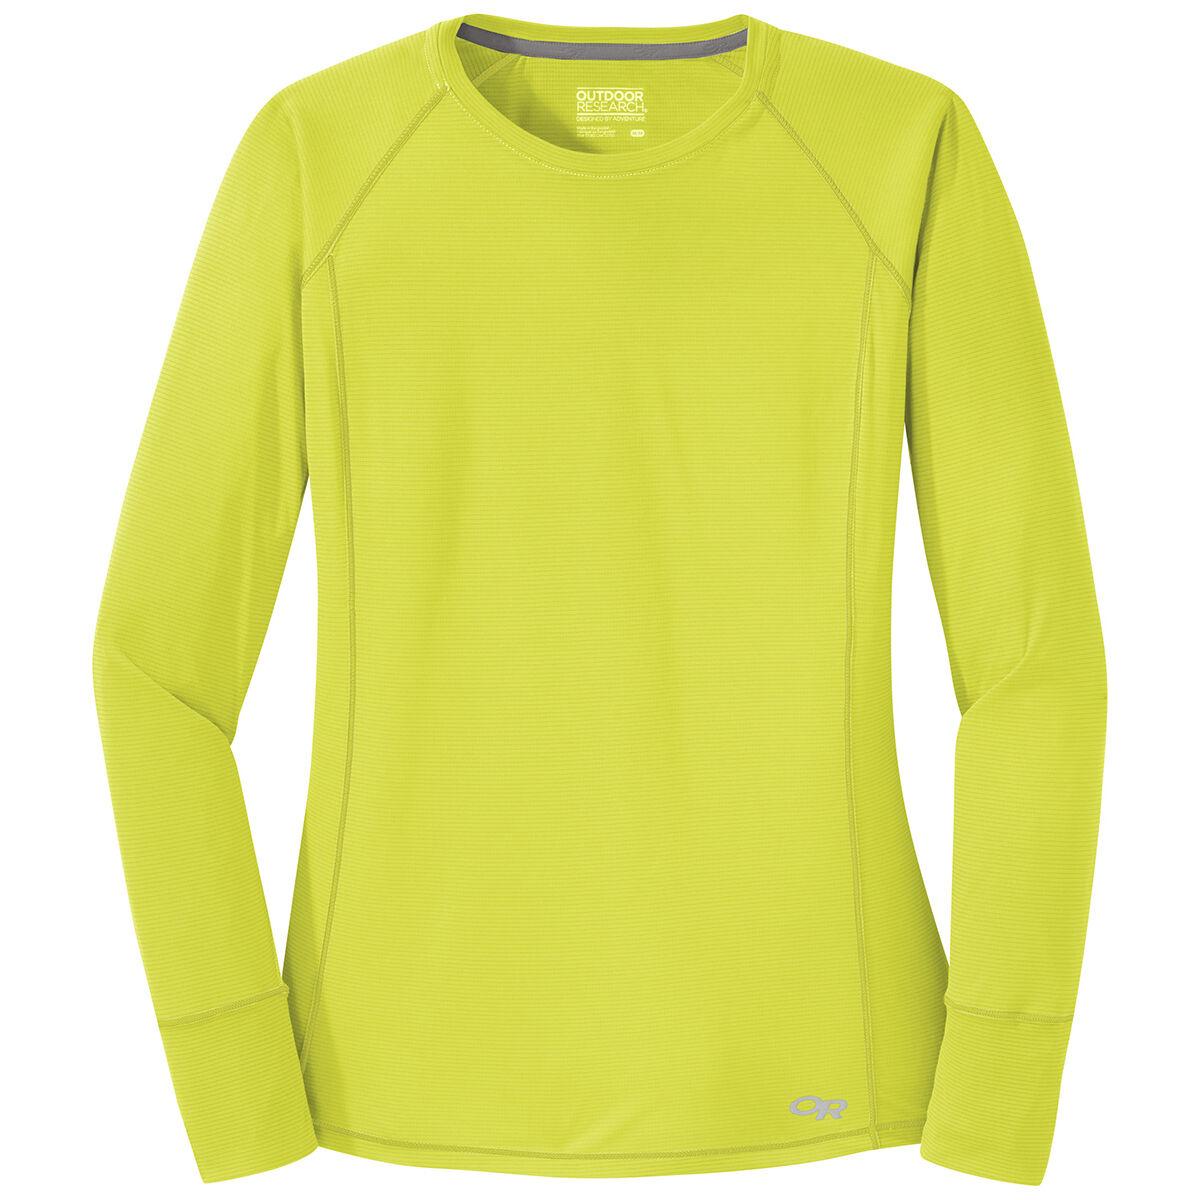 Outdoor Research Women's Echo Long-Sleeve Tee - Green, M